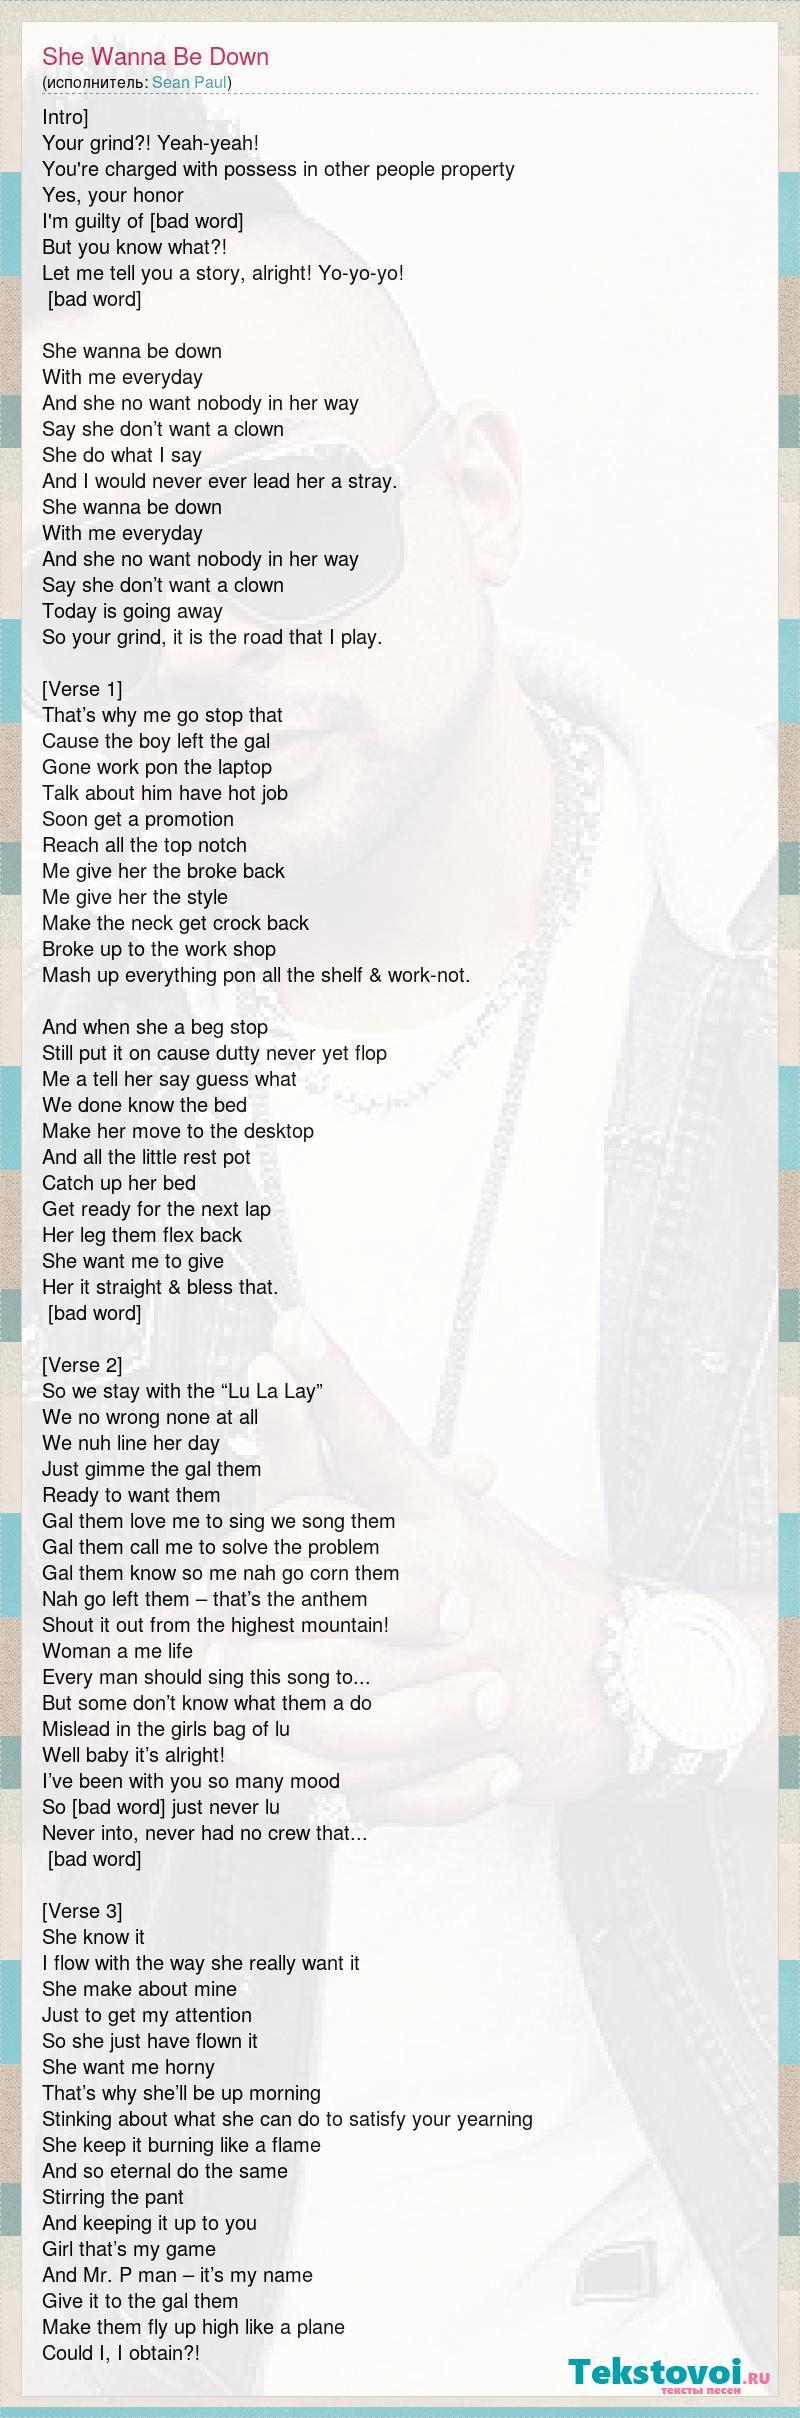 Sean Paul: She Wanna Be Down слова песни